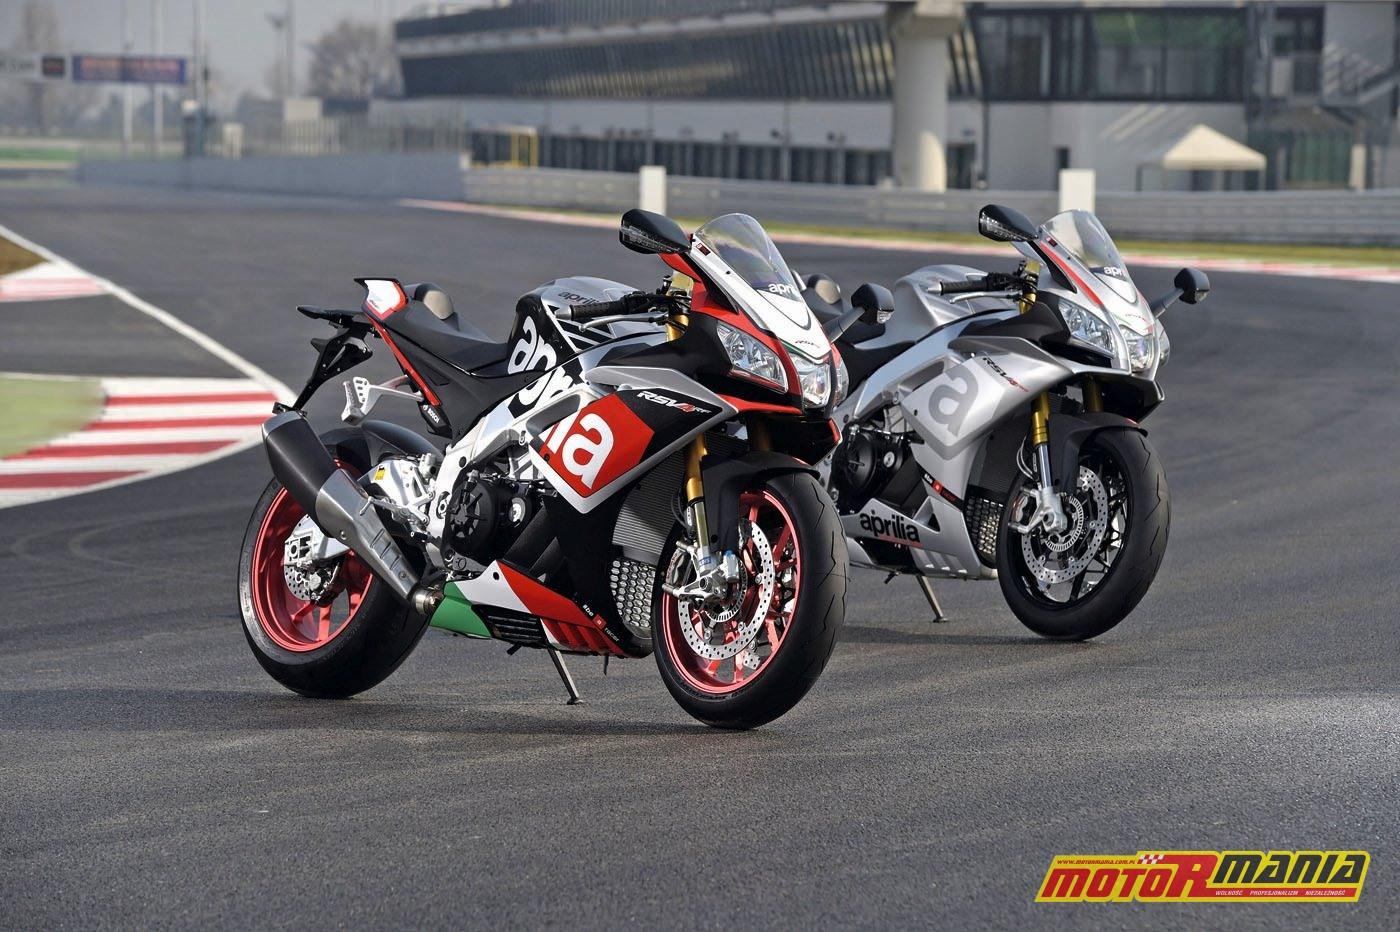 Aprilia RSV4 RF 2015 test motormania (9)